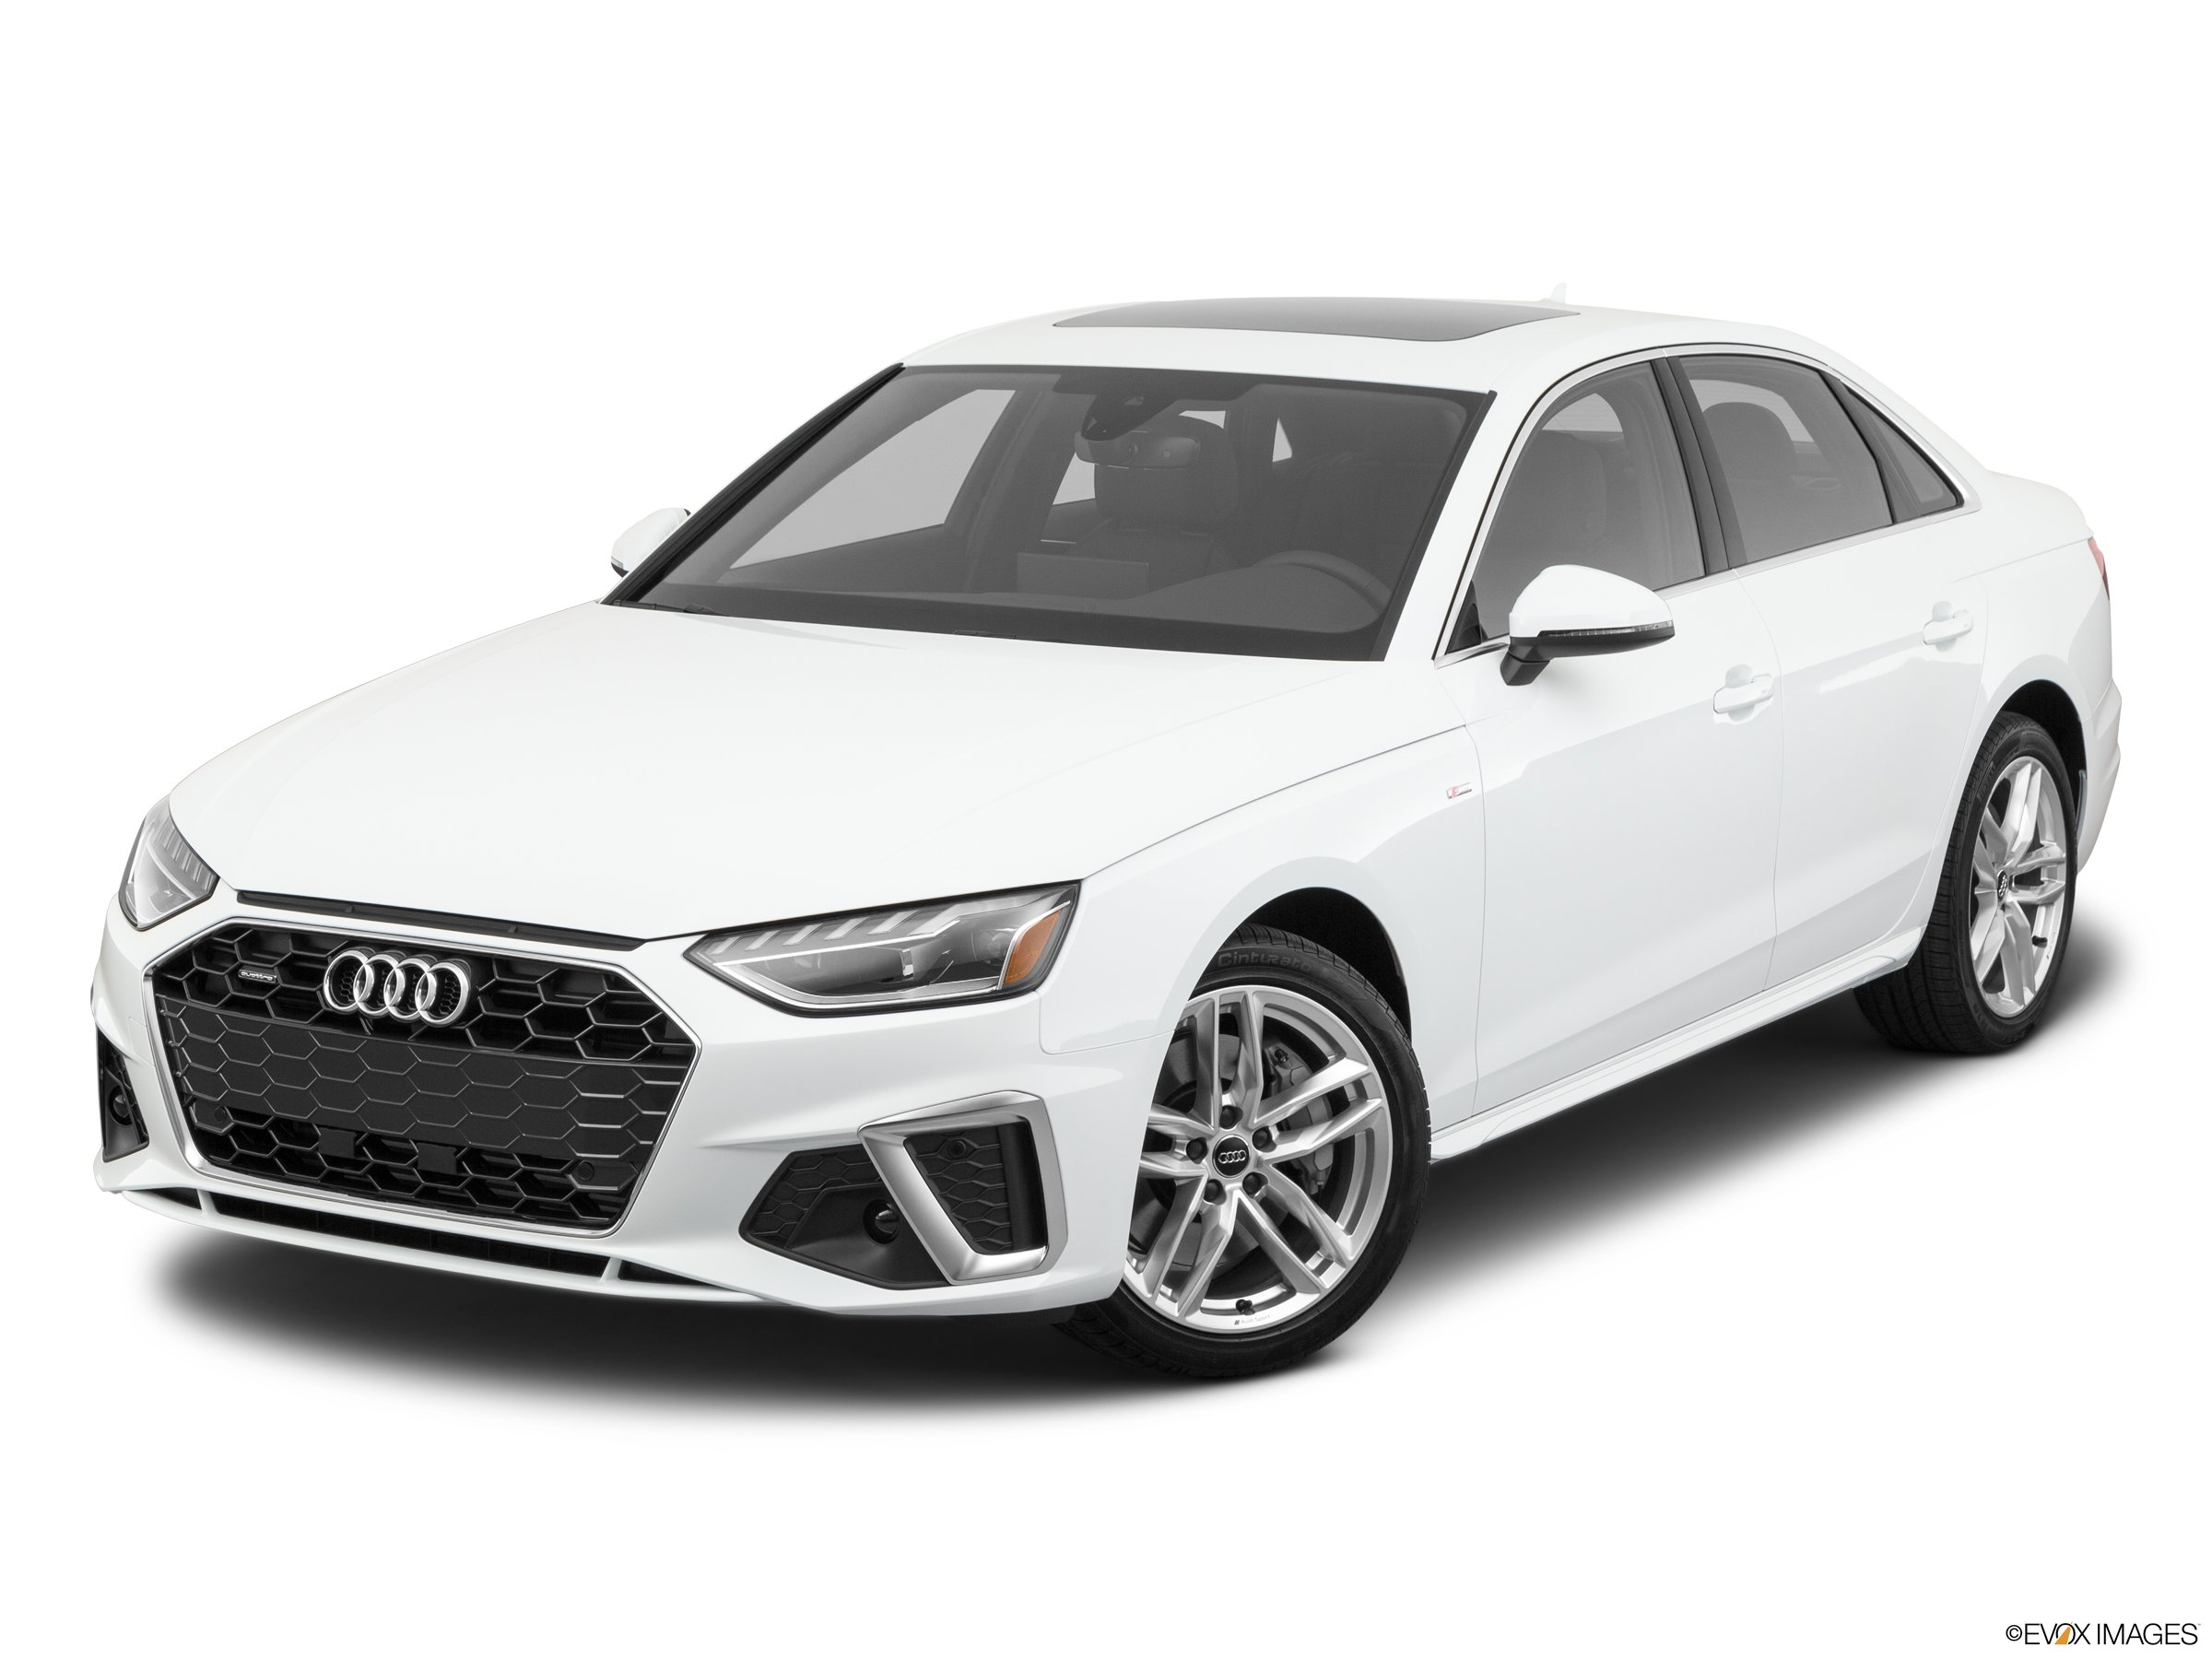 2020 Audi A4 Premium Plus 45 TFSI AWD sedan